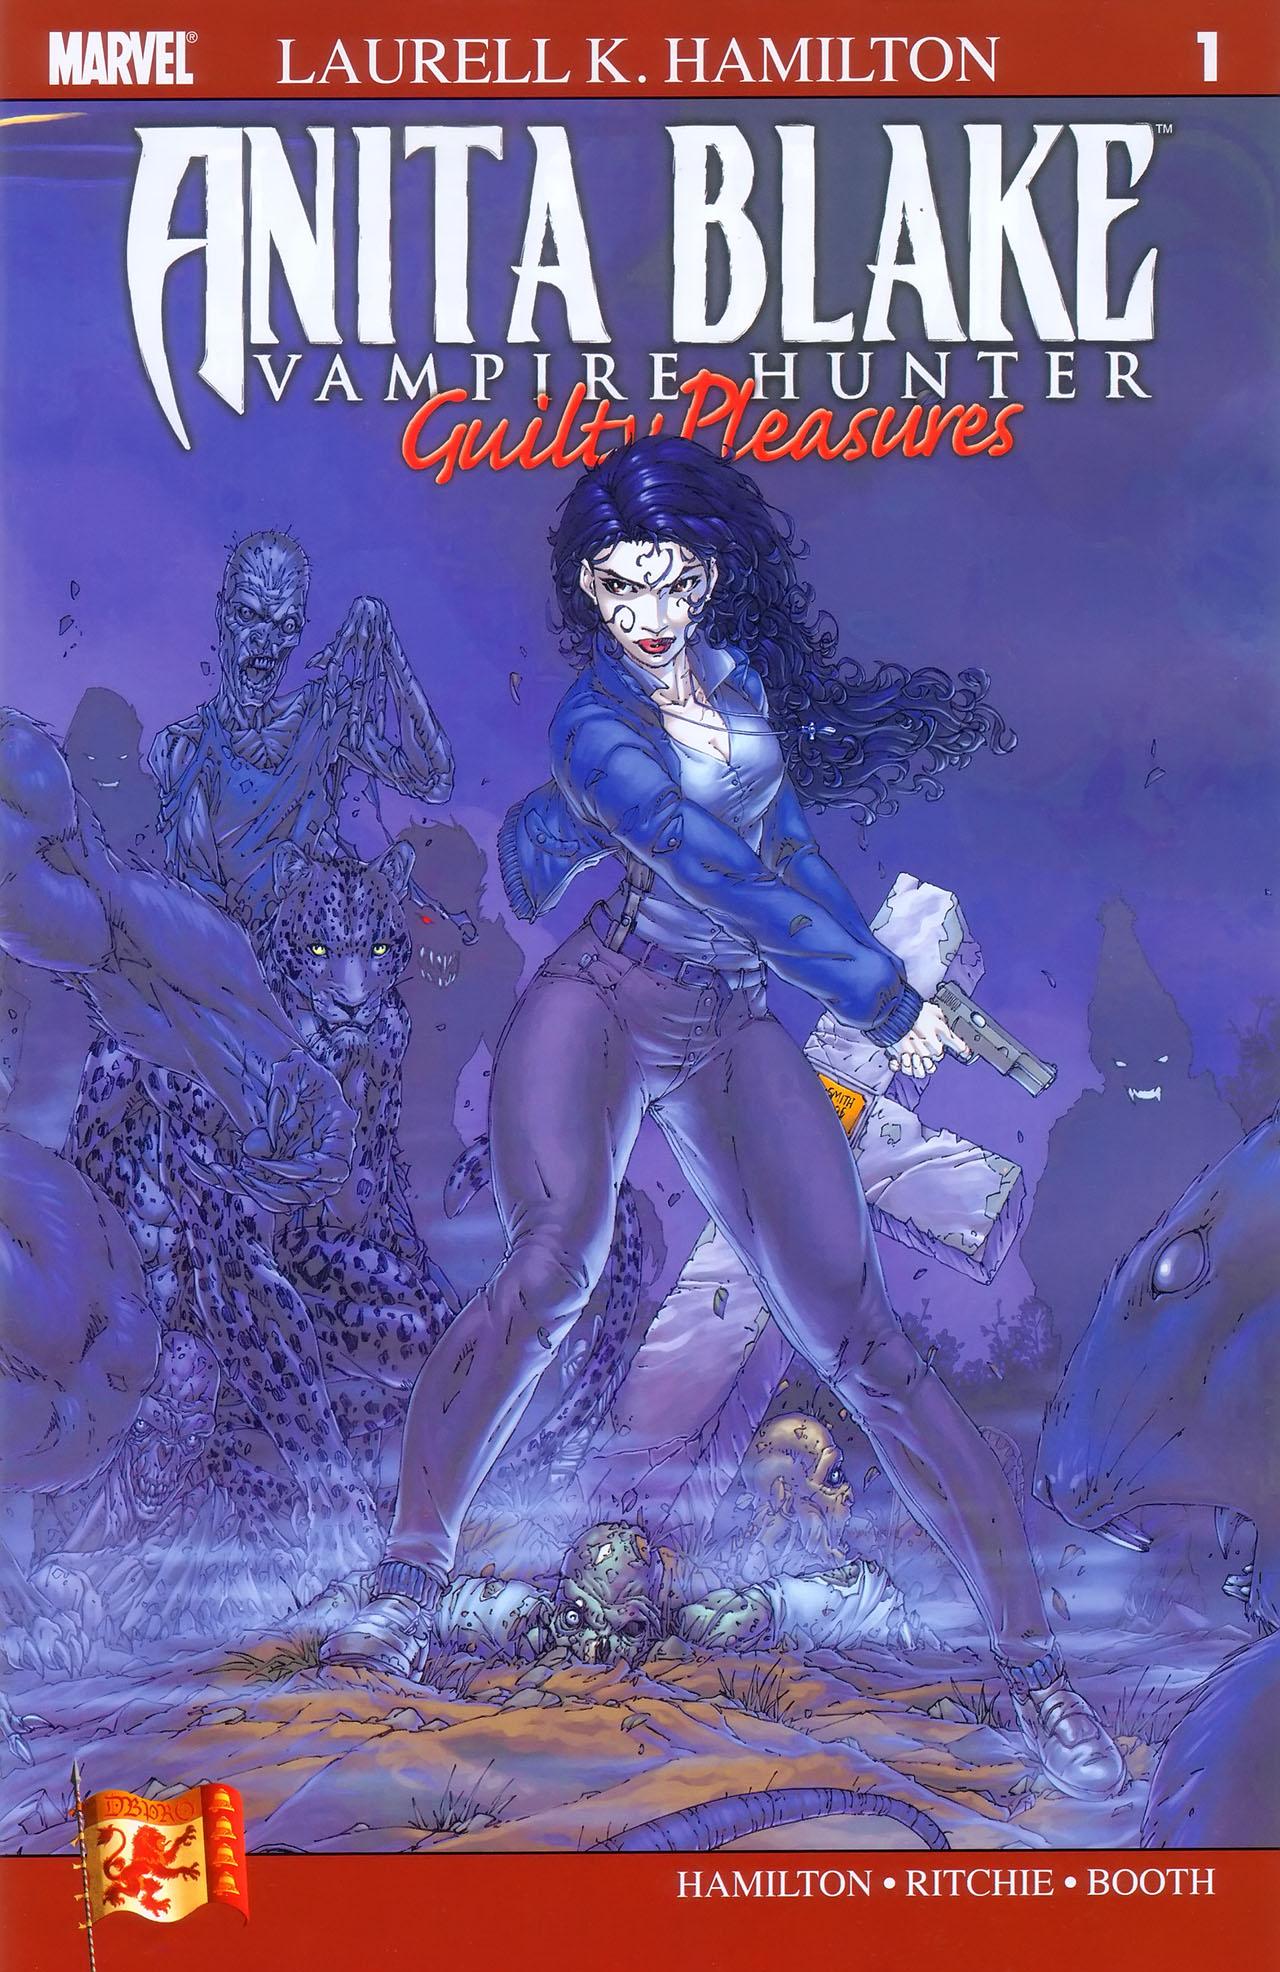 Read online Anita Blake, Vampire Hunter: Guilty Pleasures comic -  Issue #1 - 2